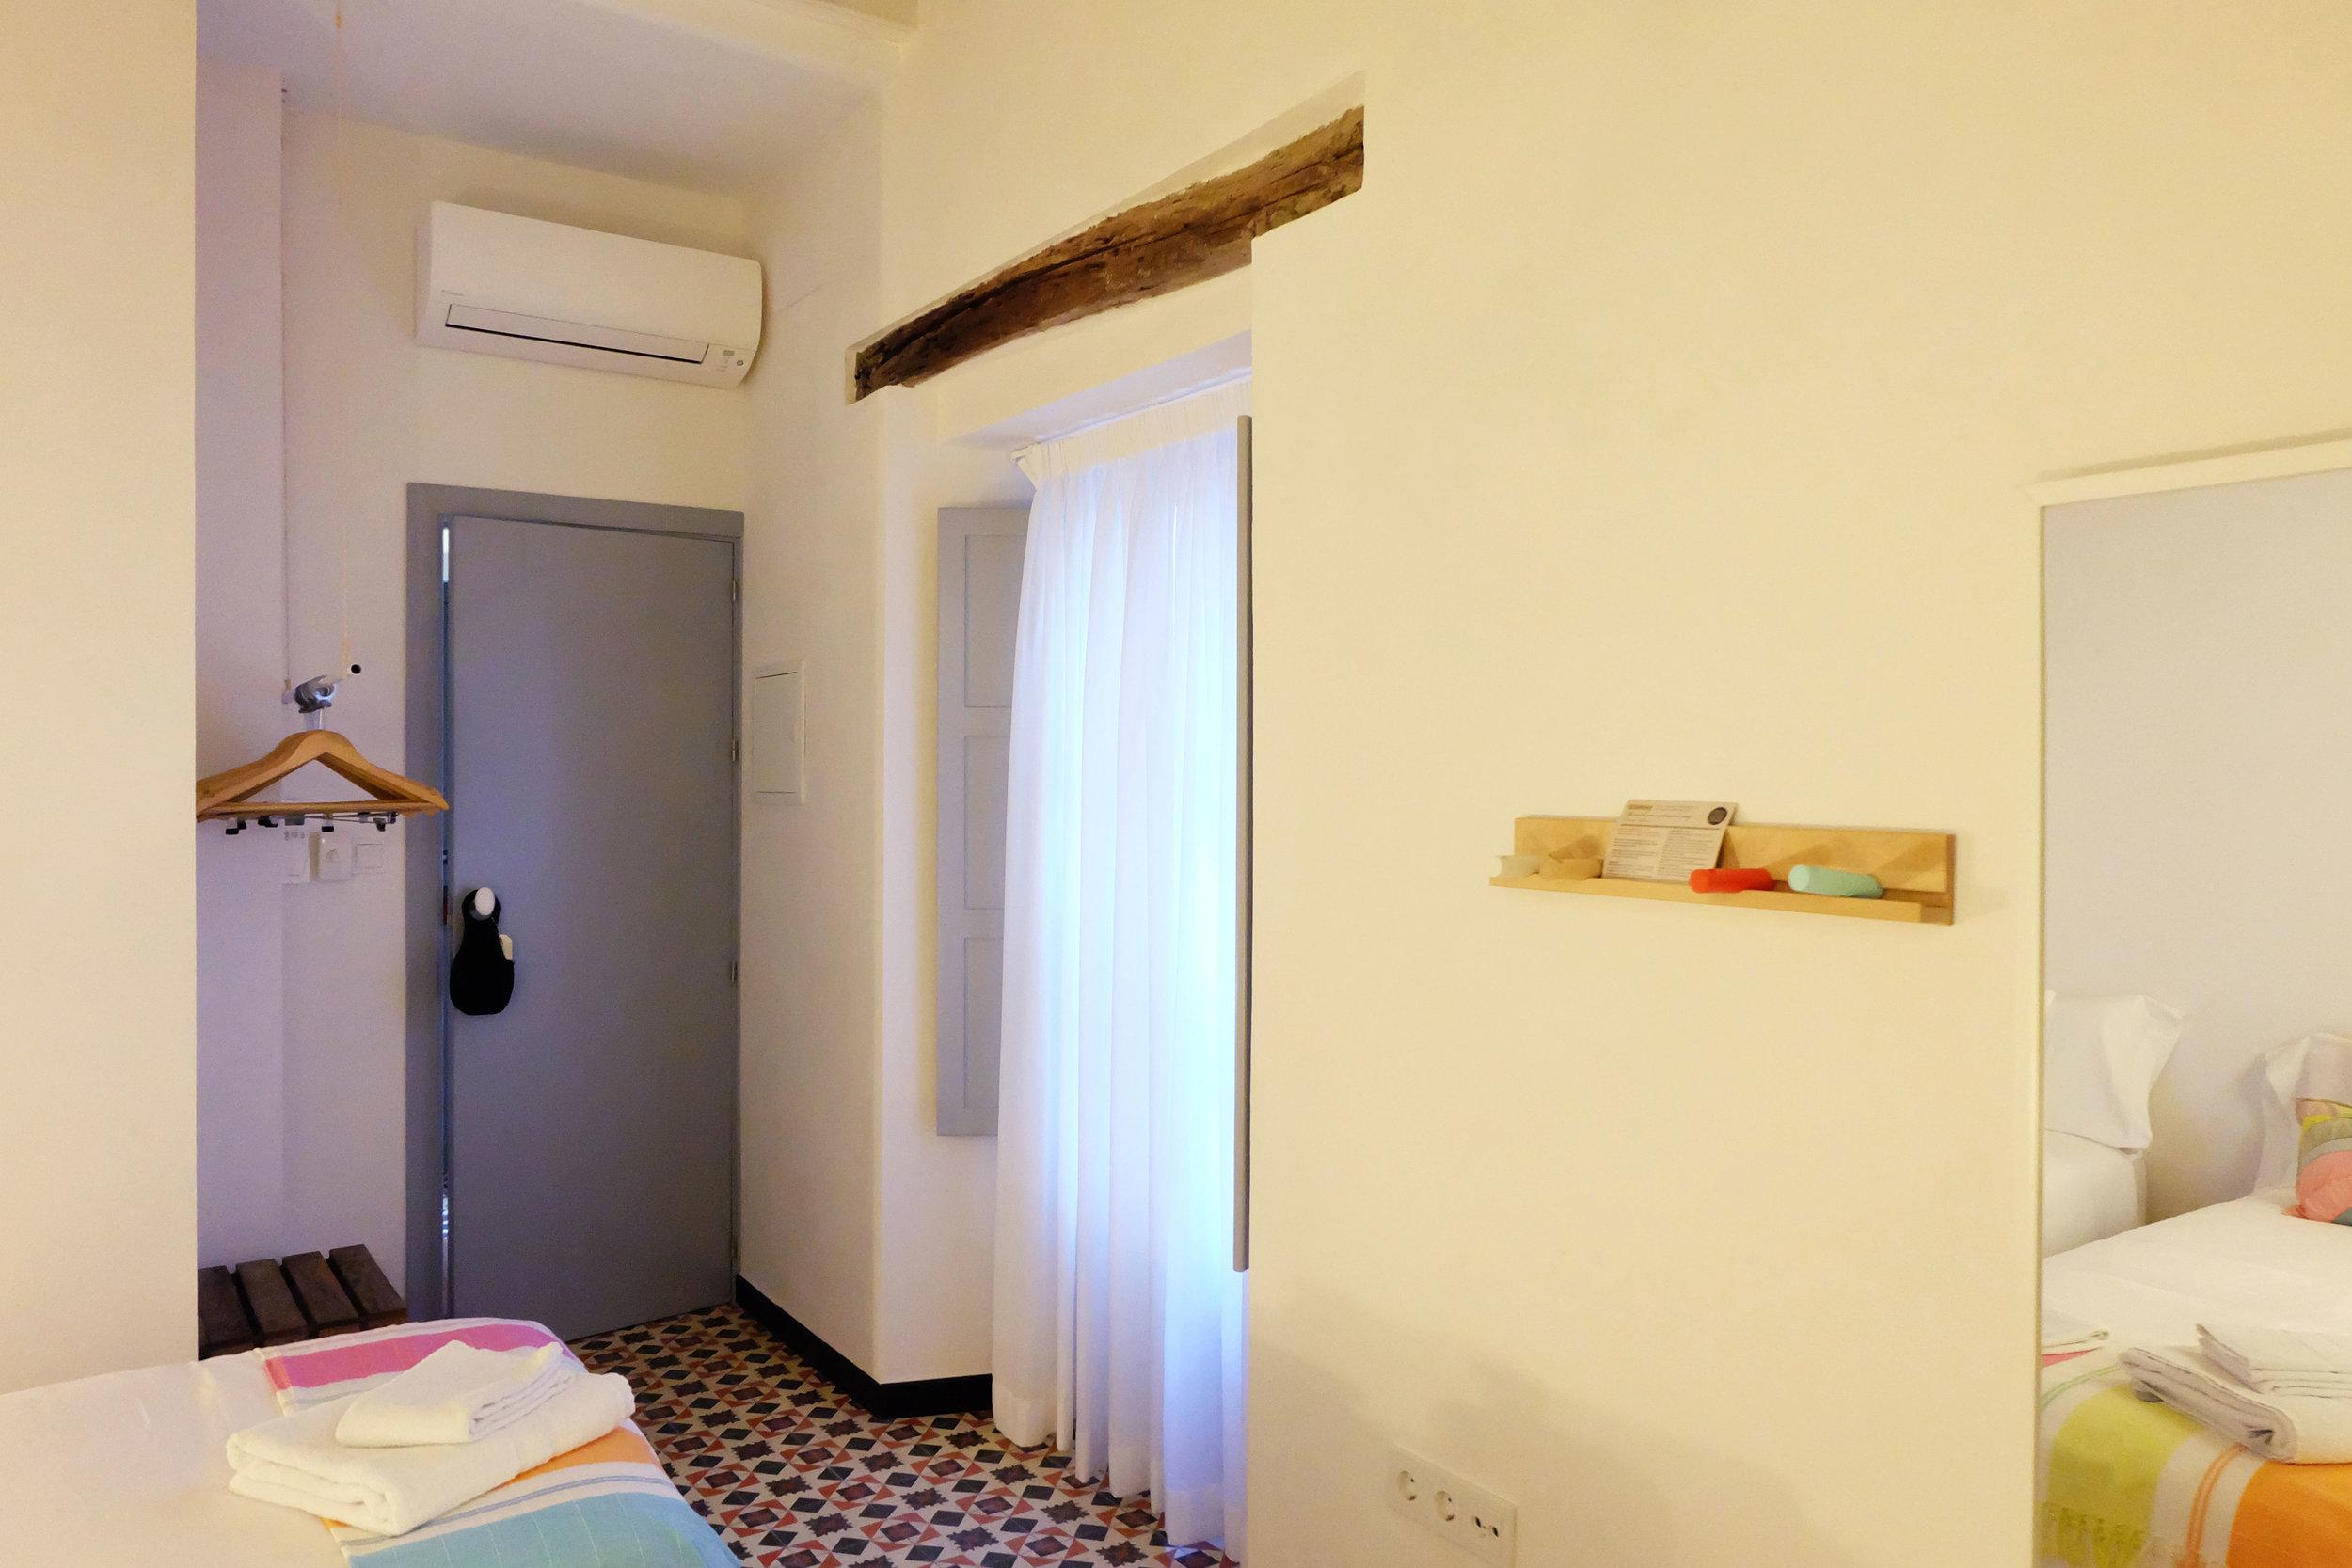 Hotel-Casa-de-Huespedes-Santa-Maria-Habitacion-2-7.jpg